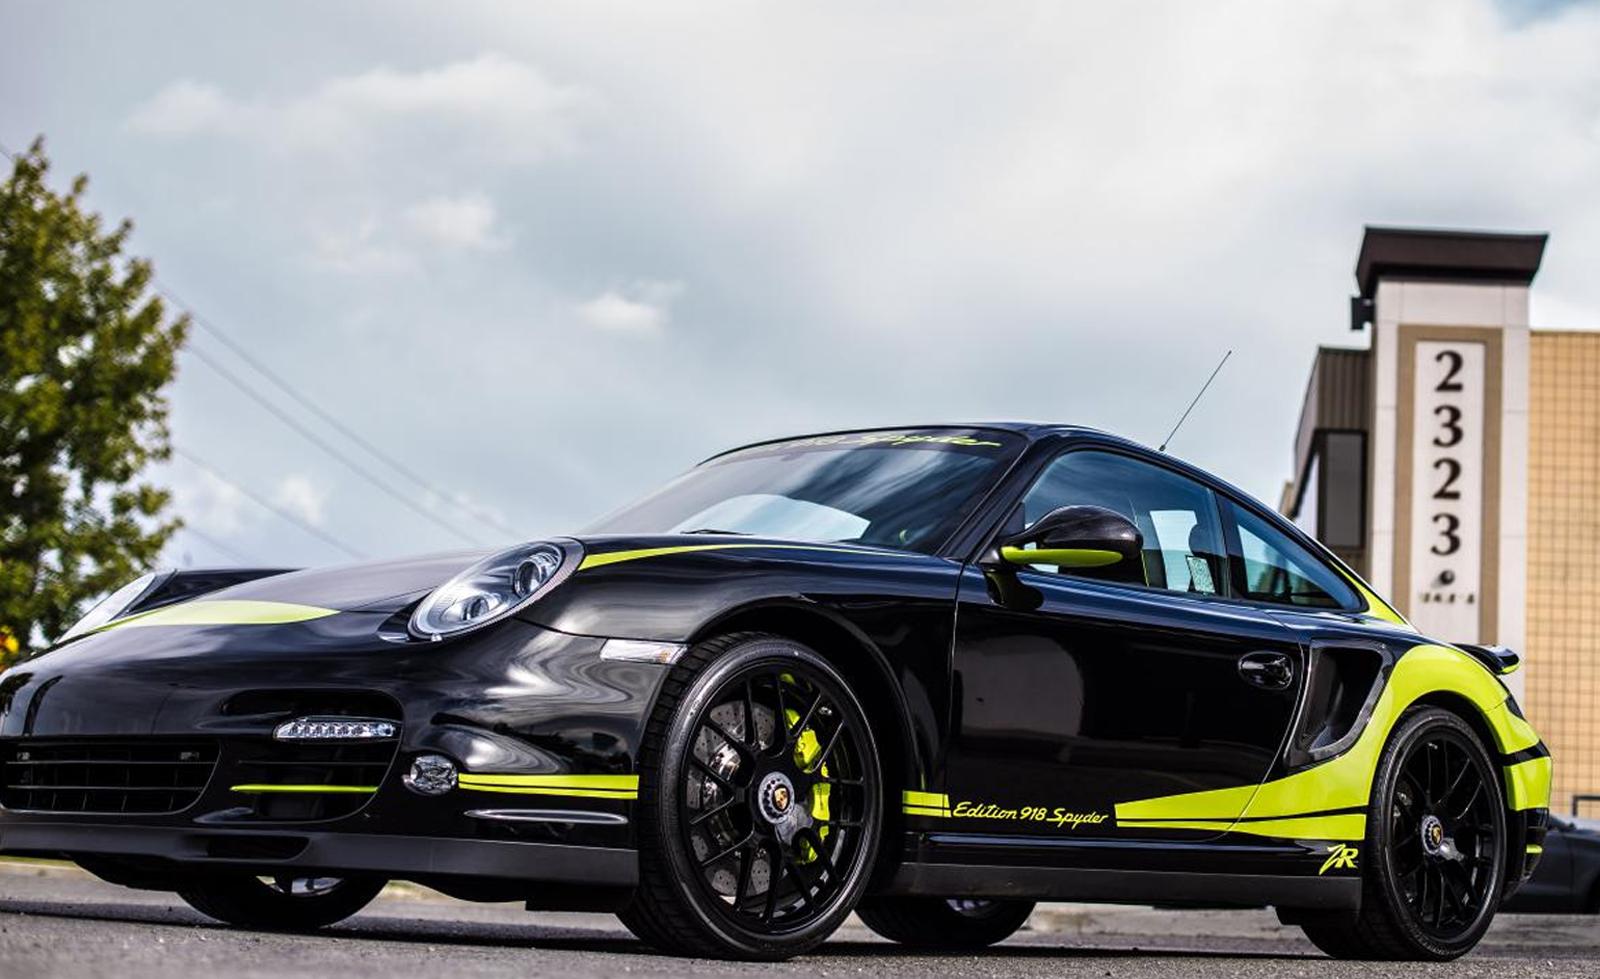 porsche 911 turbo s edition 918 spyder by zr auto gtspirit. Black Bedroom Furniture Sets. Home Design Ideas